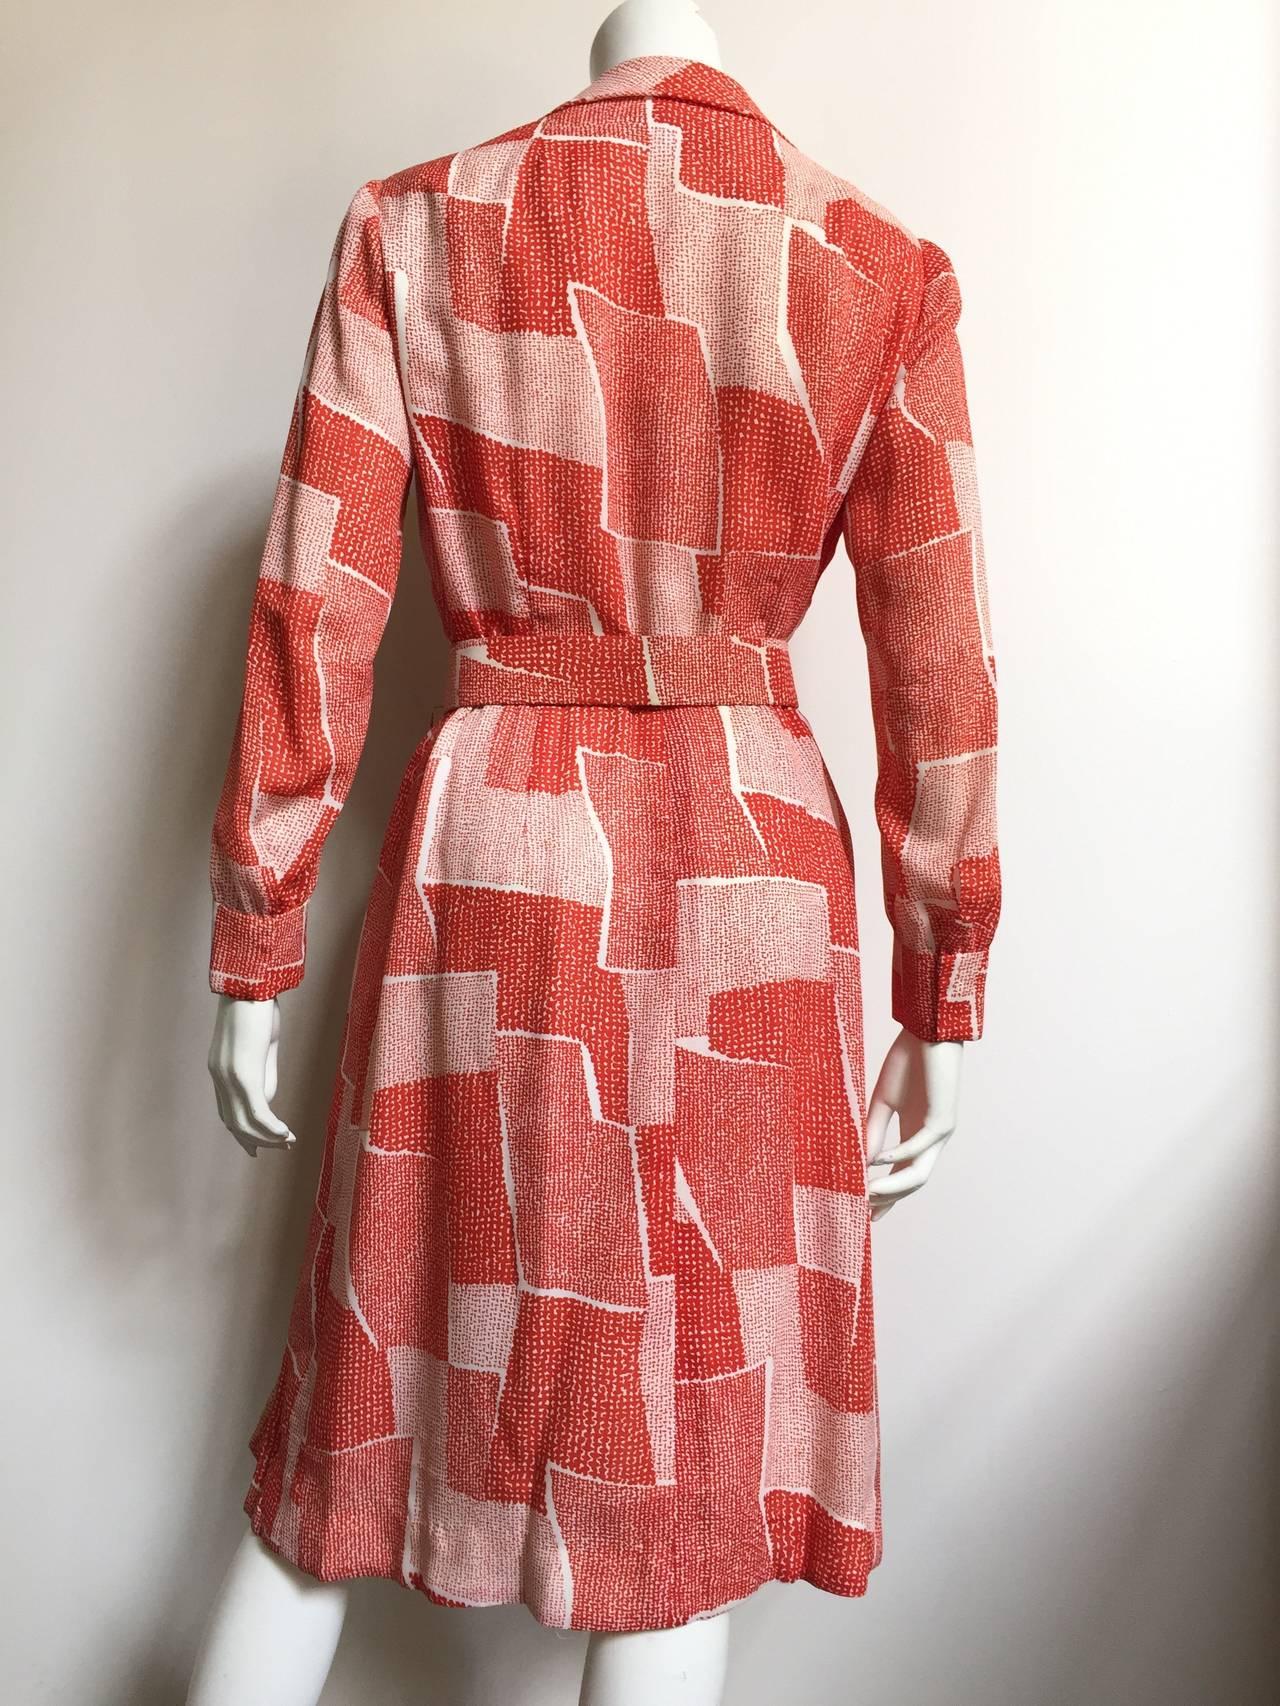 Women's Adele Simpson 70s Dress Size 8. For Sale